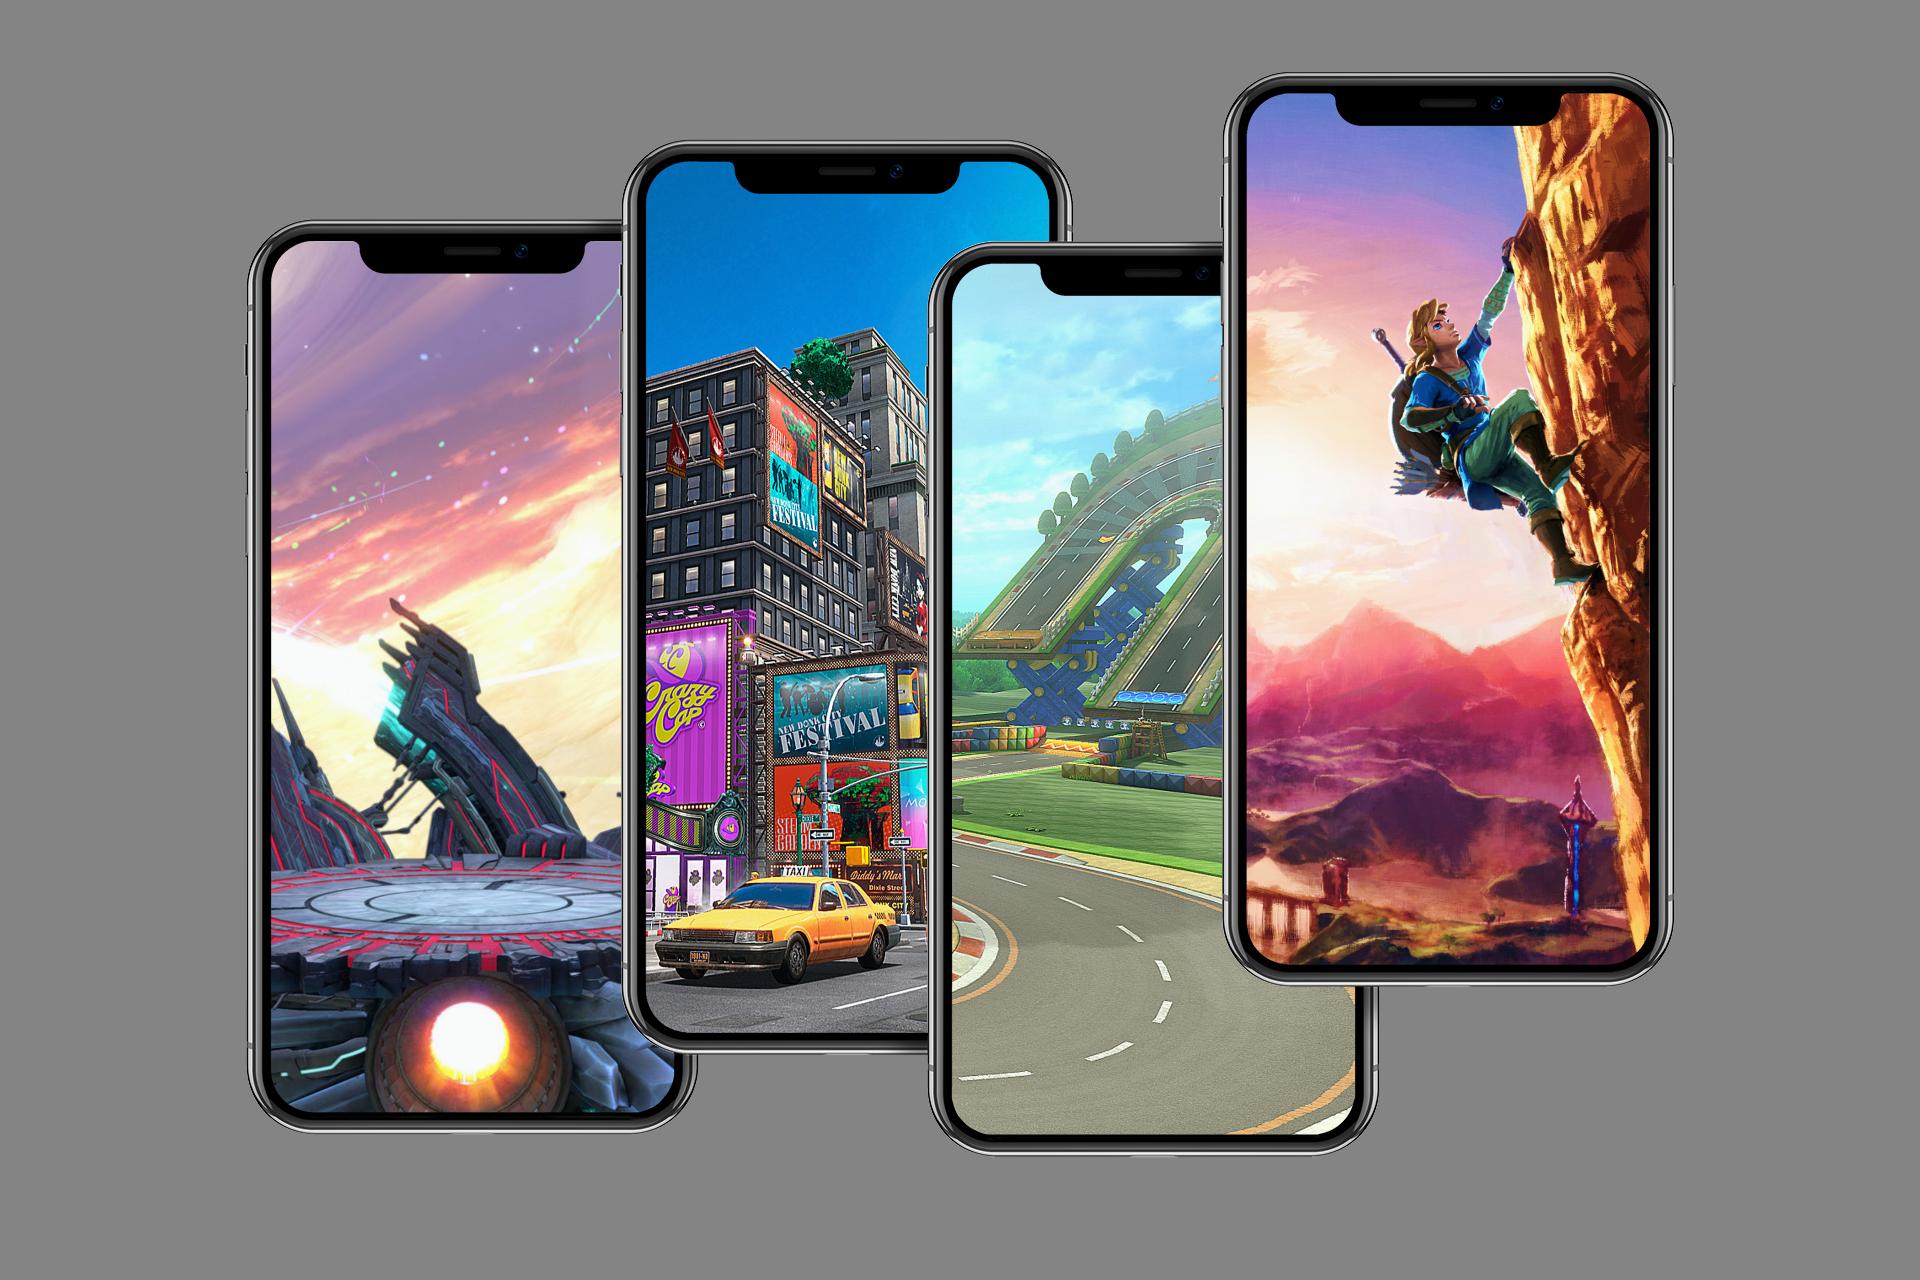 Nintendo iPhone wallpaper mockup